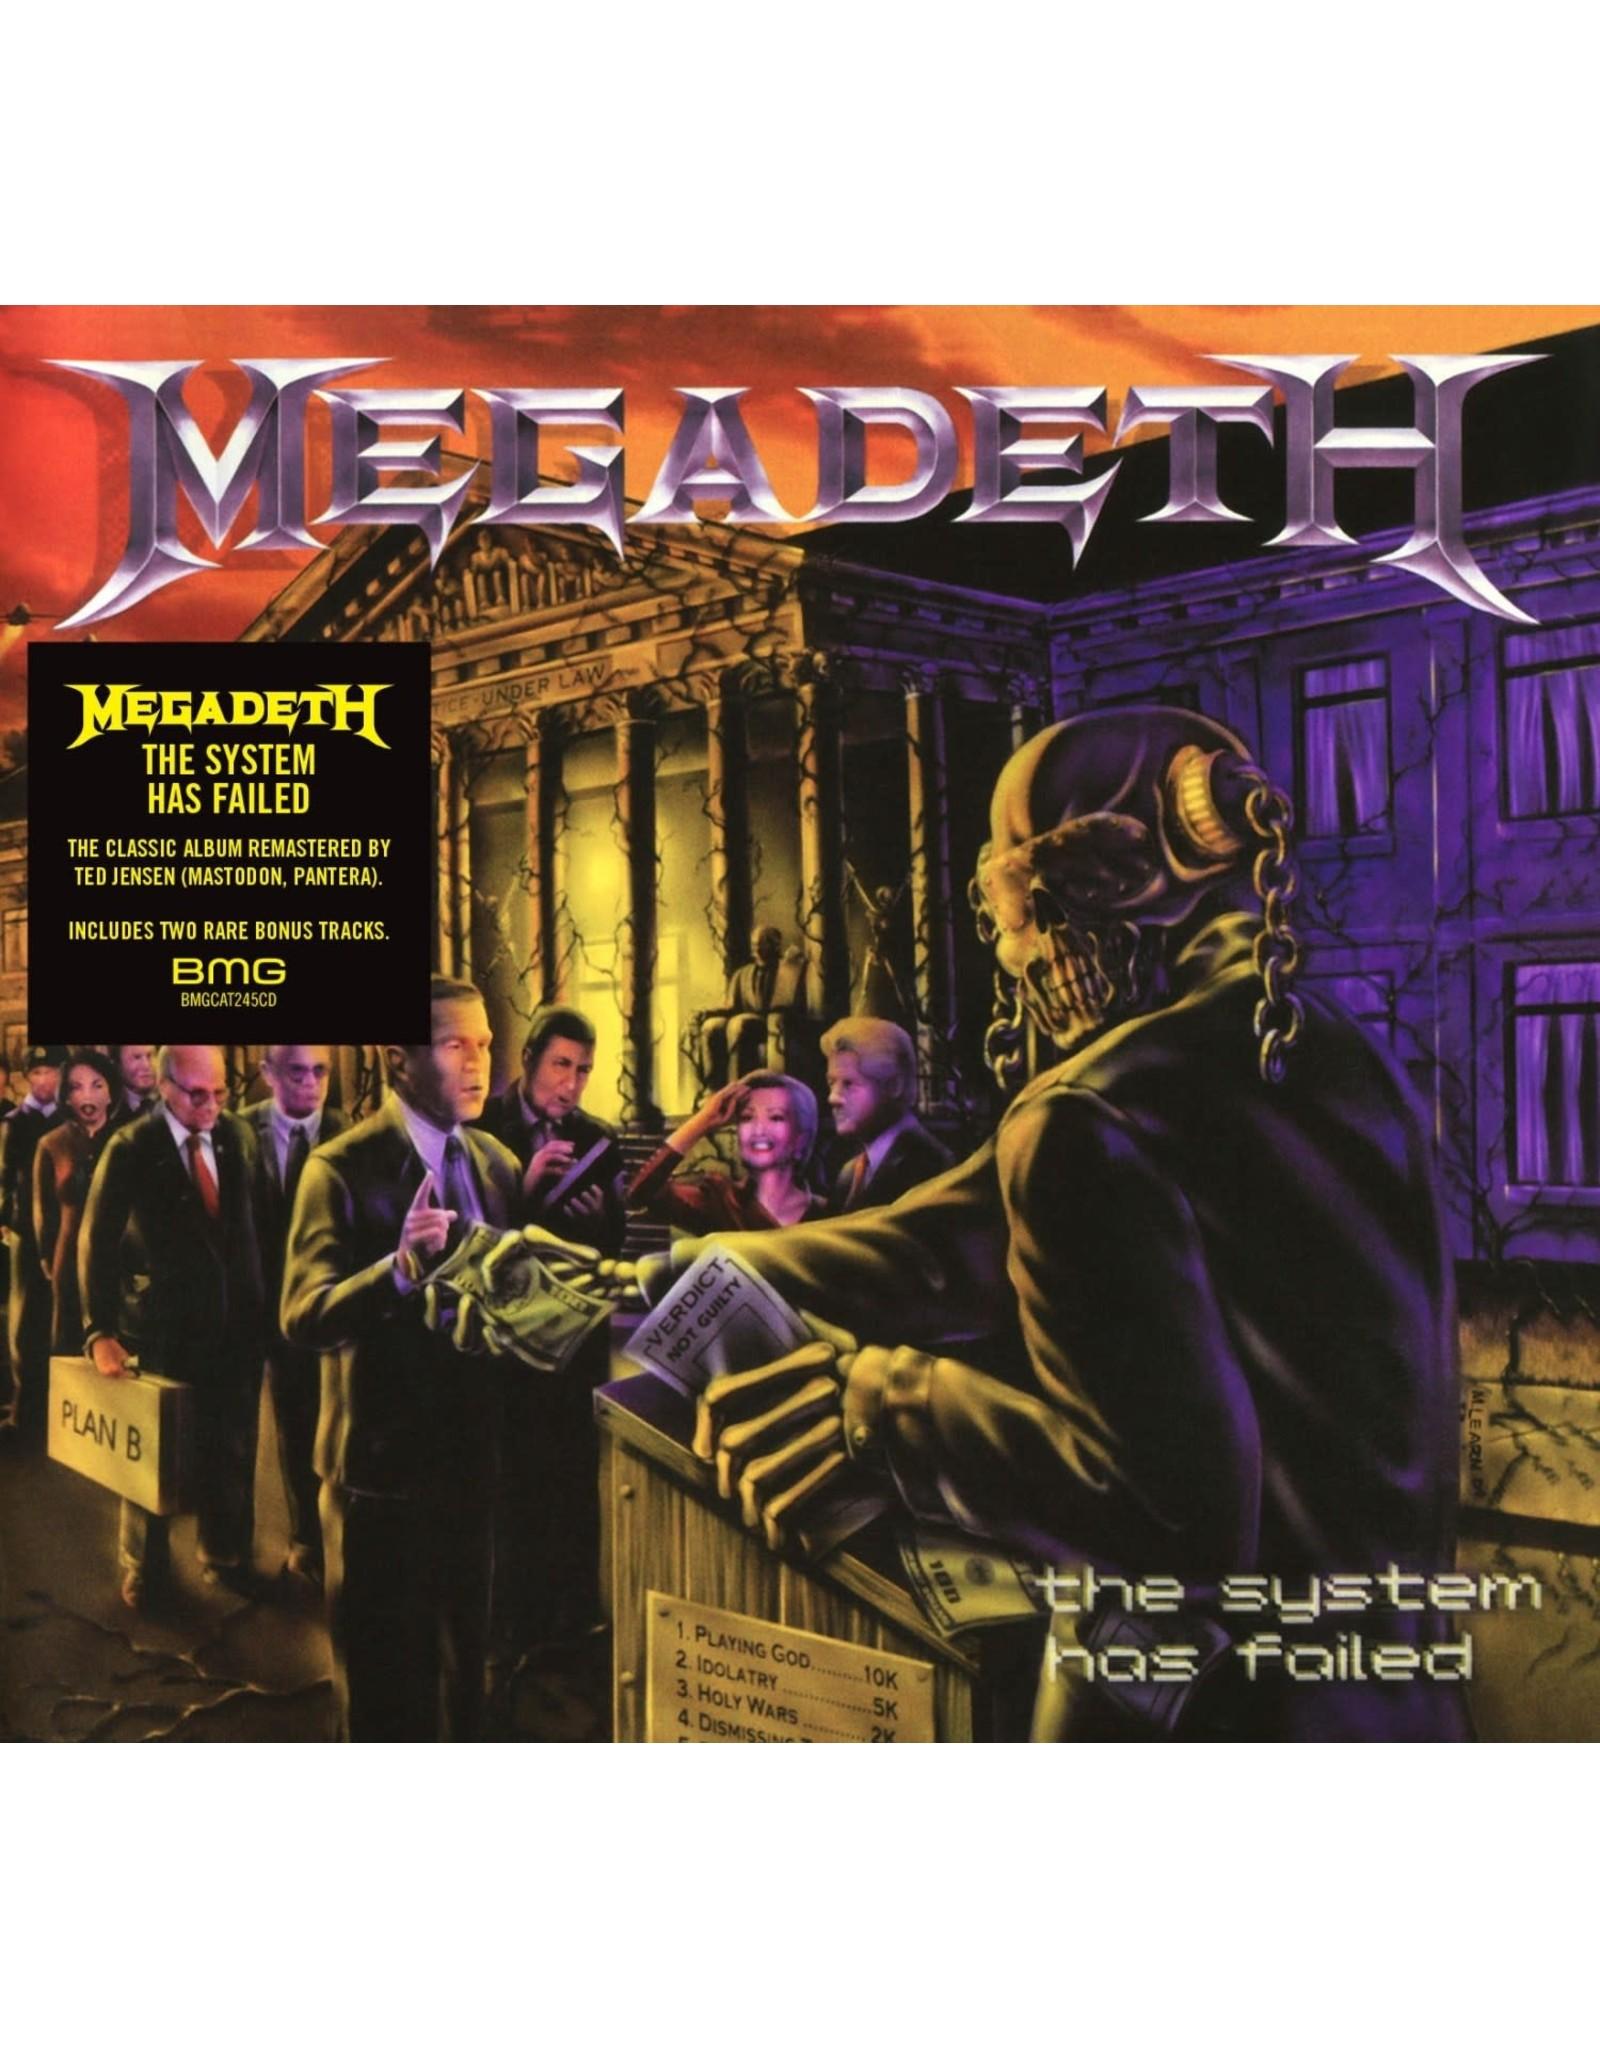 Megadeth - The System Has Failed LP